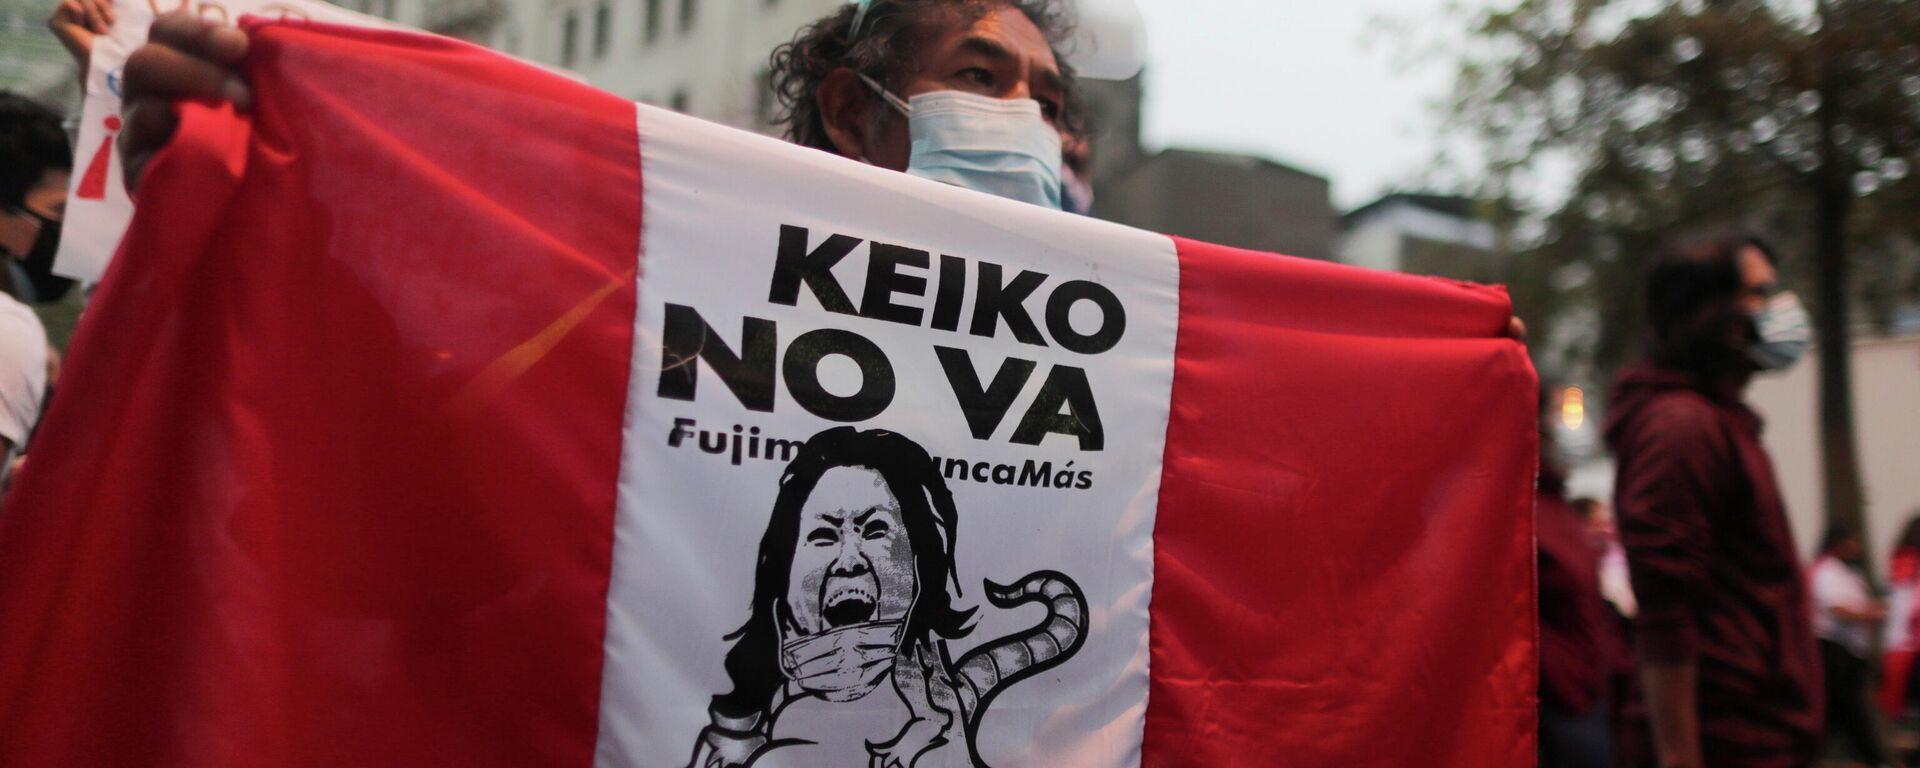 Marcha contra candidatura de Keiko Fujimori (Archivo) - Sputnik Mundo, 1920, 31.05.2021